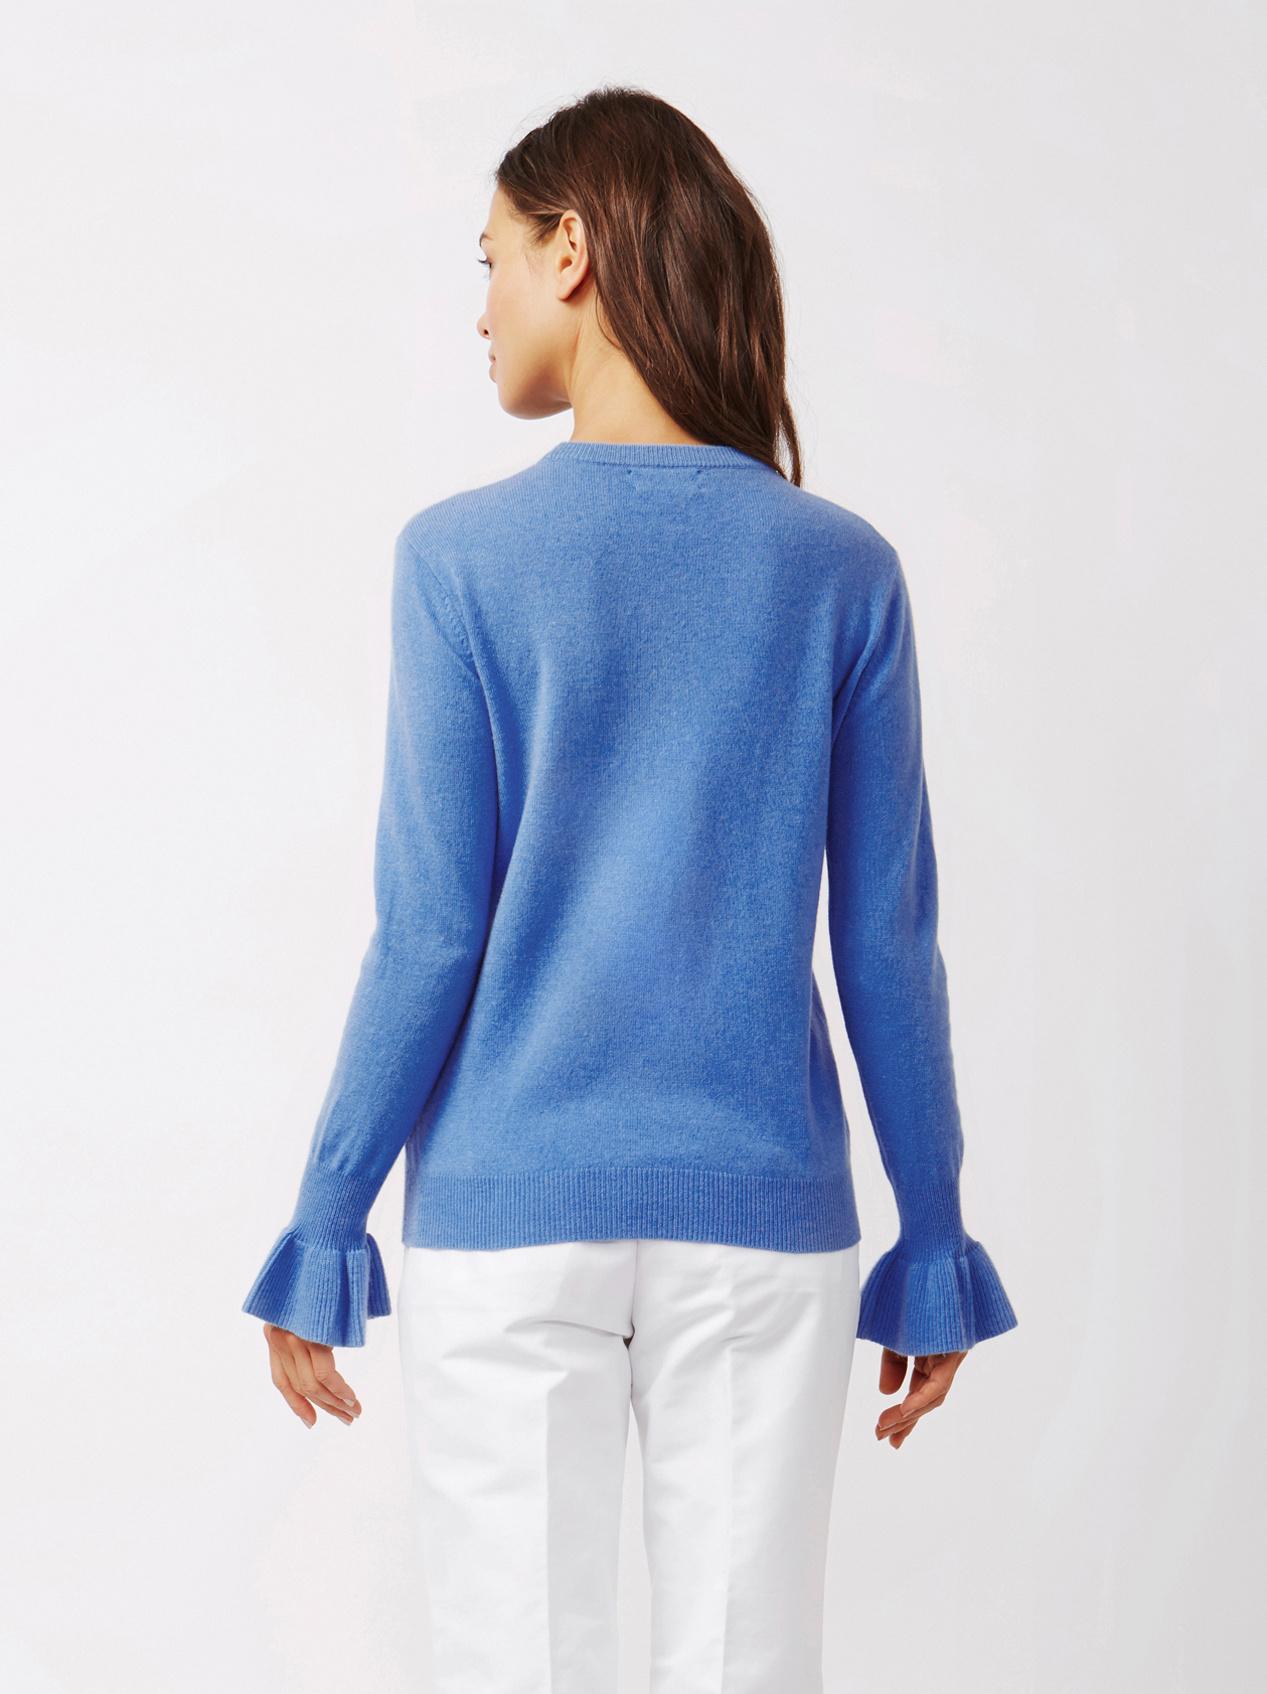 Soft Goat Women's Frill Sweater Sky Blue